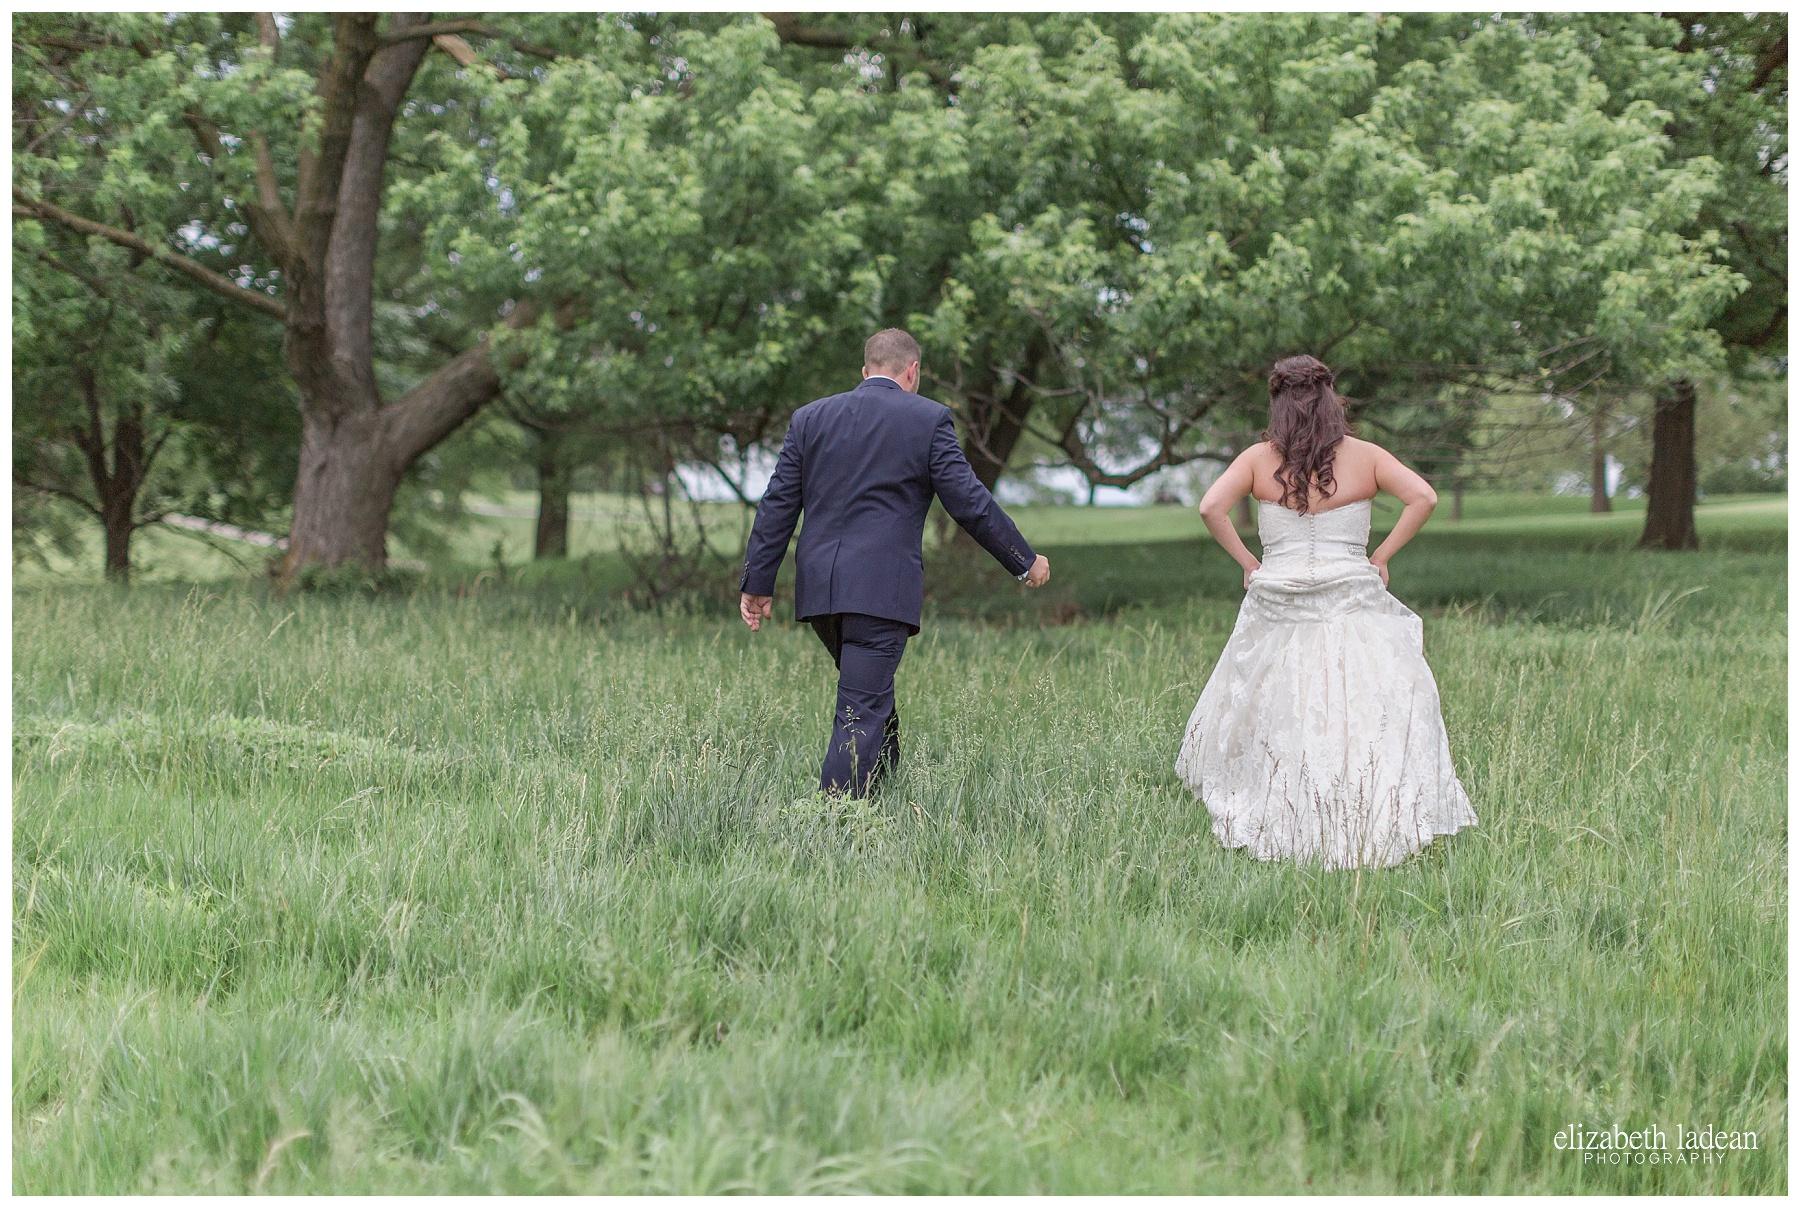 Hillcrest-Country-Club-Kansas-City-Wedding-Photography-E+J-0520-Elizabeth-Ladean-Photography-photo_0867.jpg